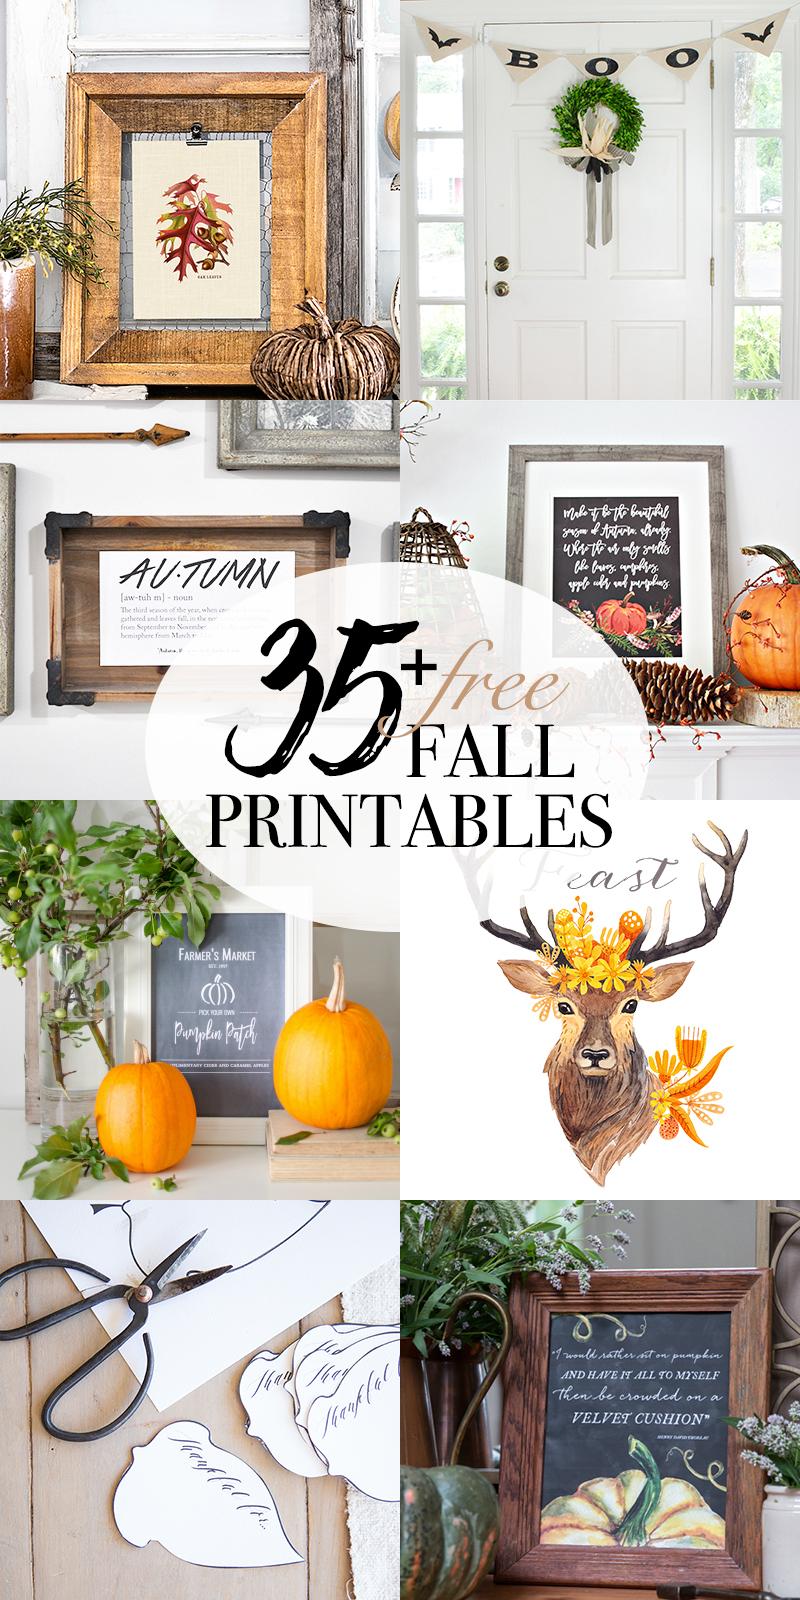 Make it be beautiful Autumn printable and Fall mantel